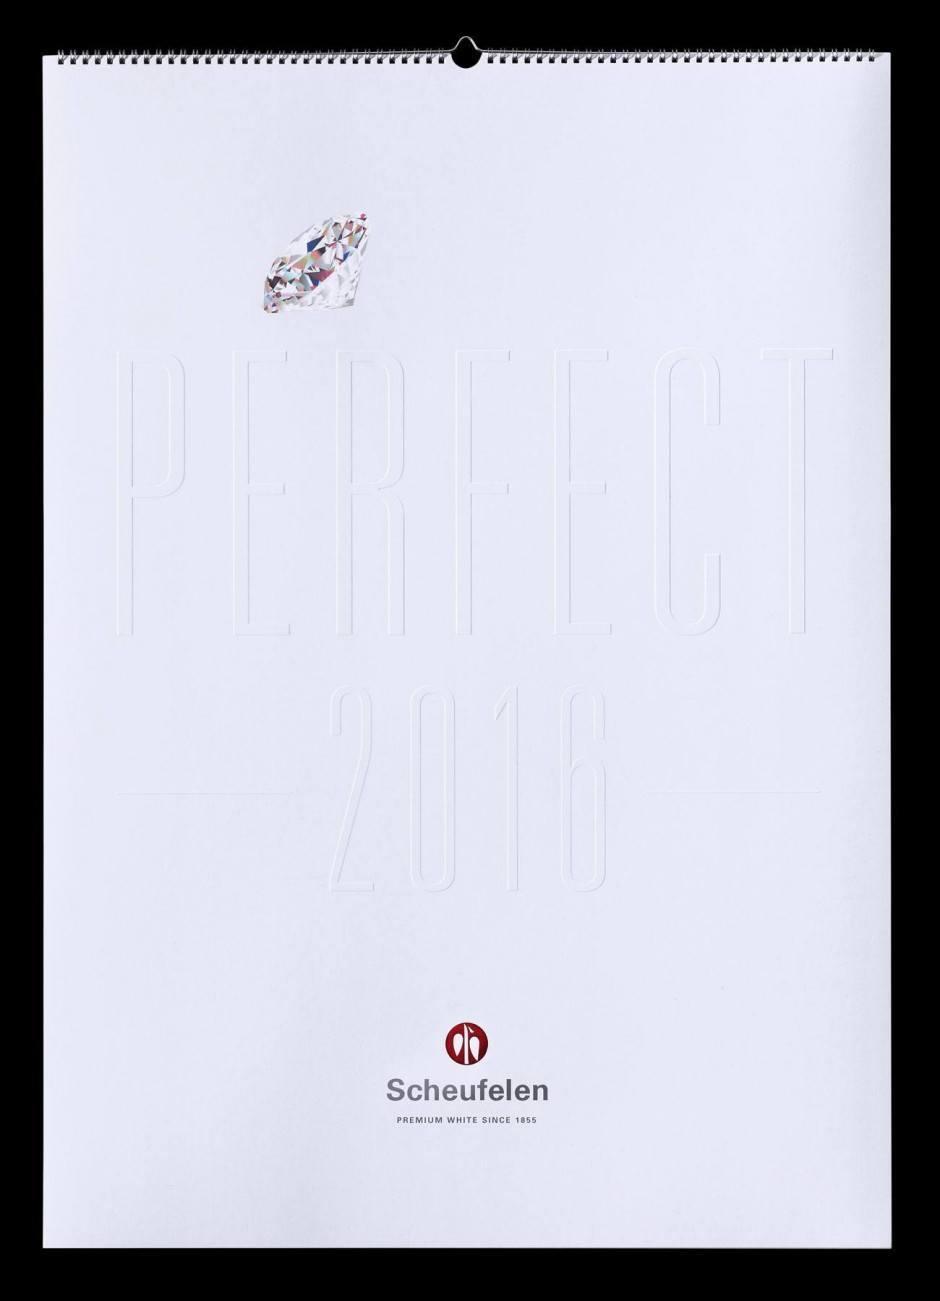 »Perfect« – Scheufelen Kalender 2016